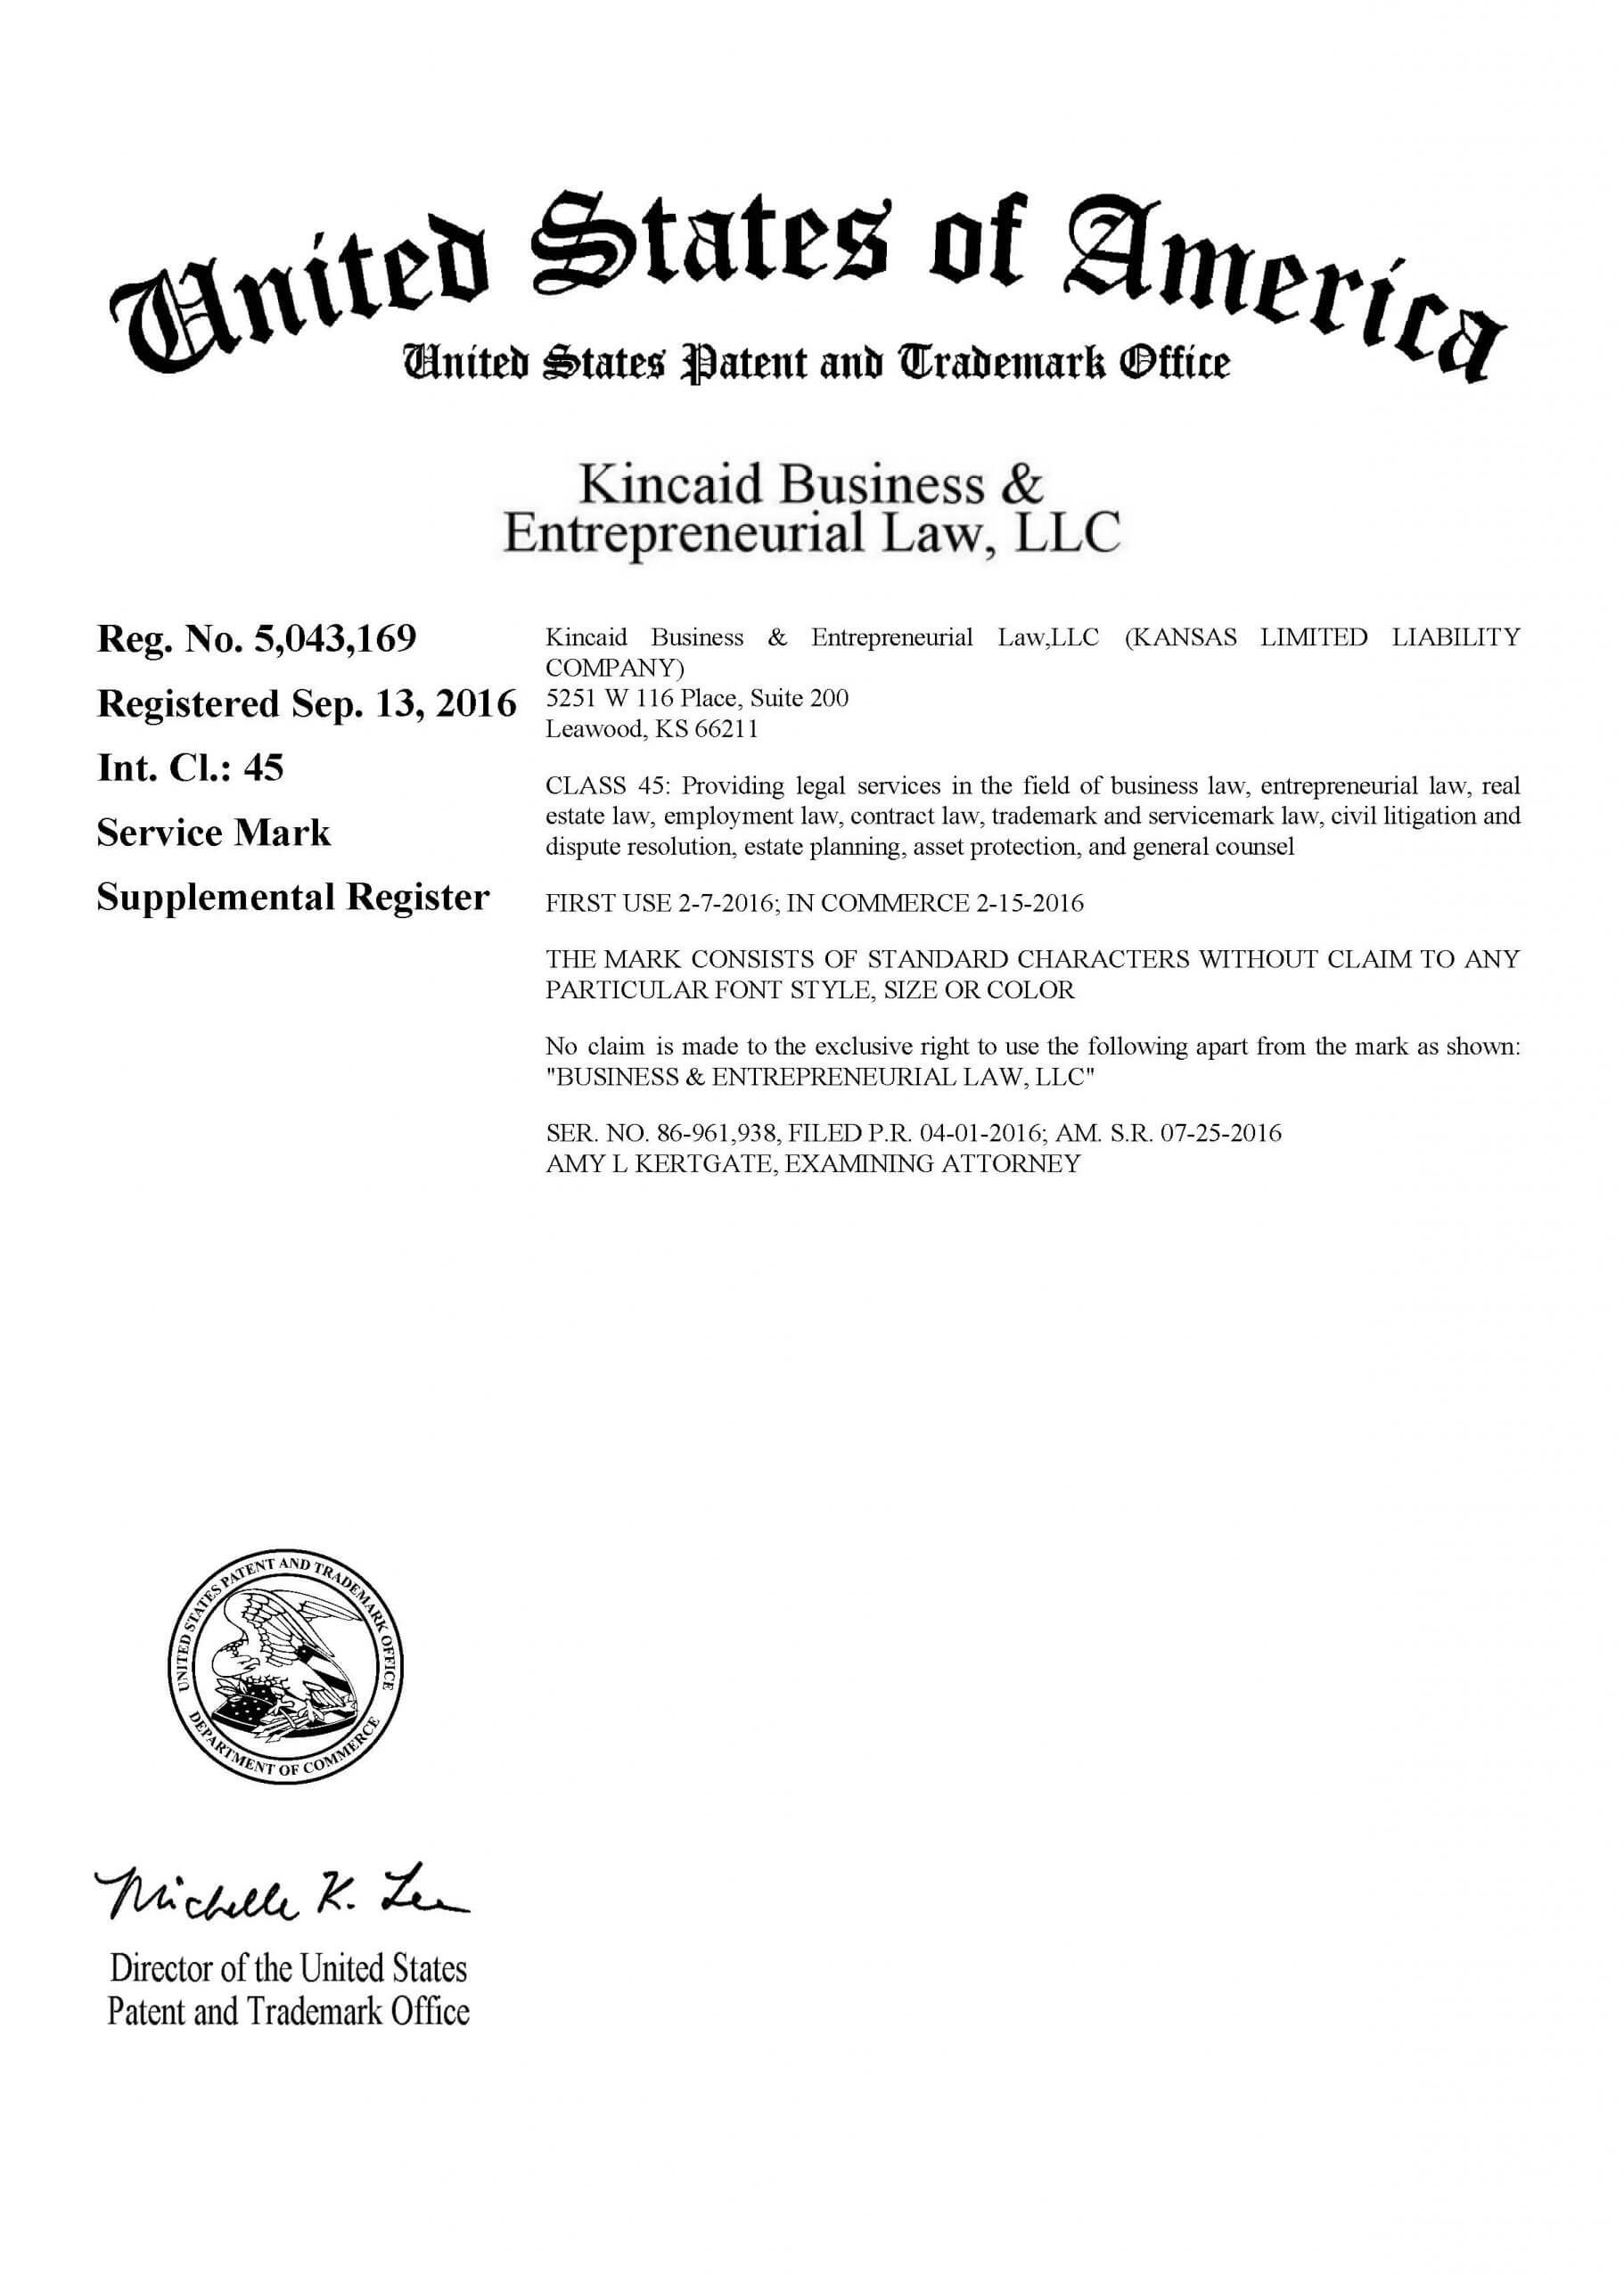 Trademark Registration Certificate With USPTO